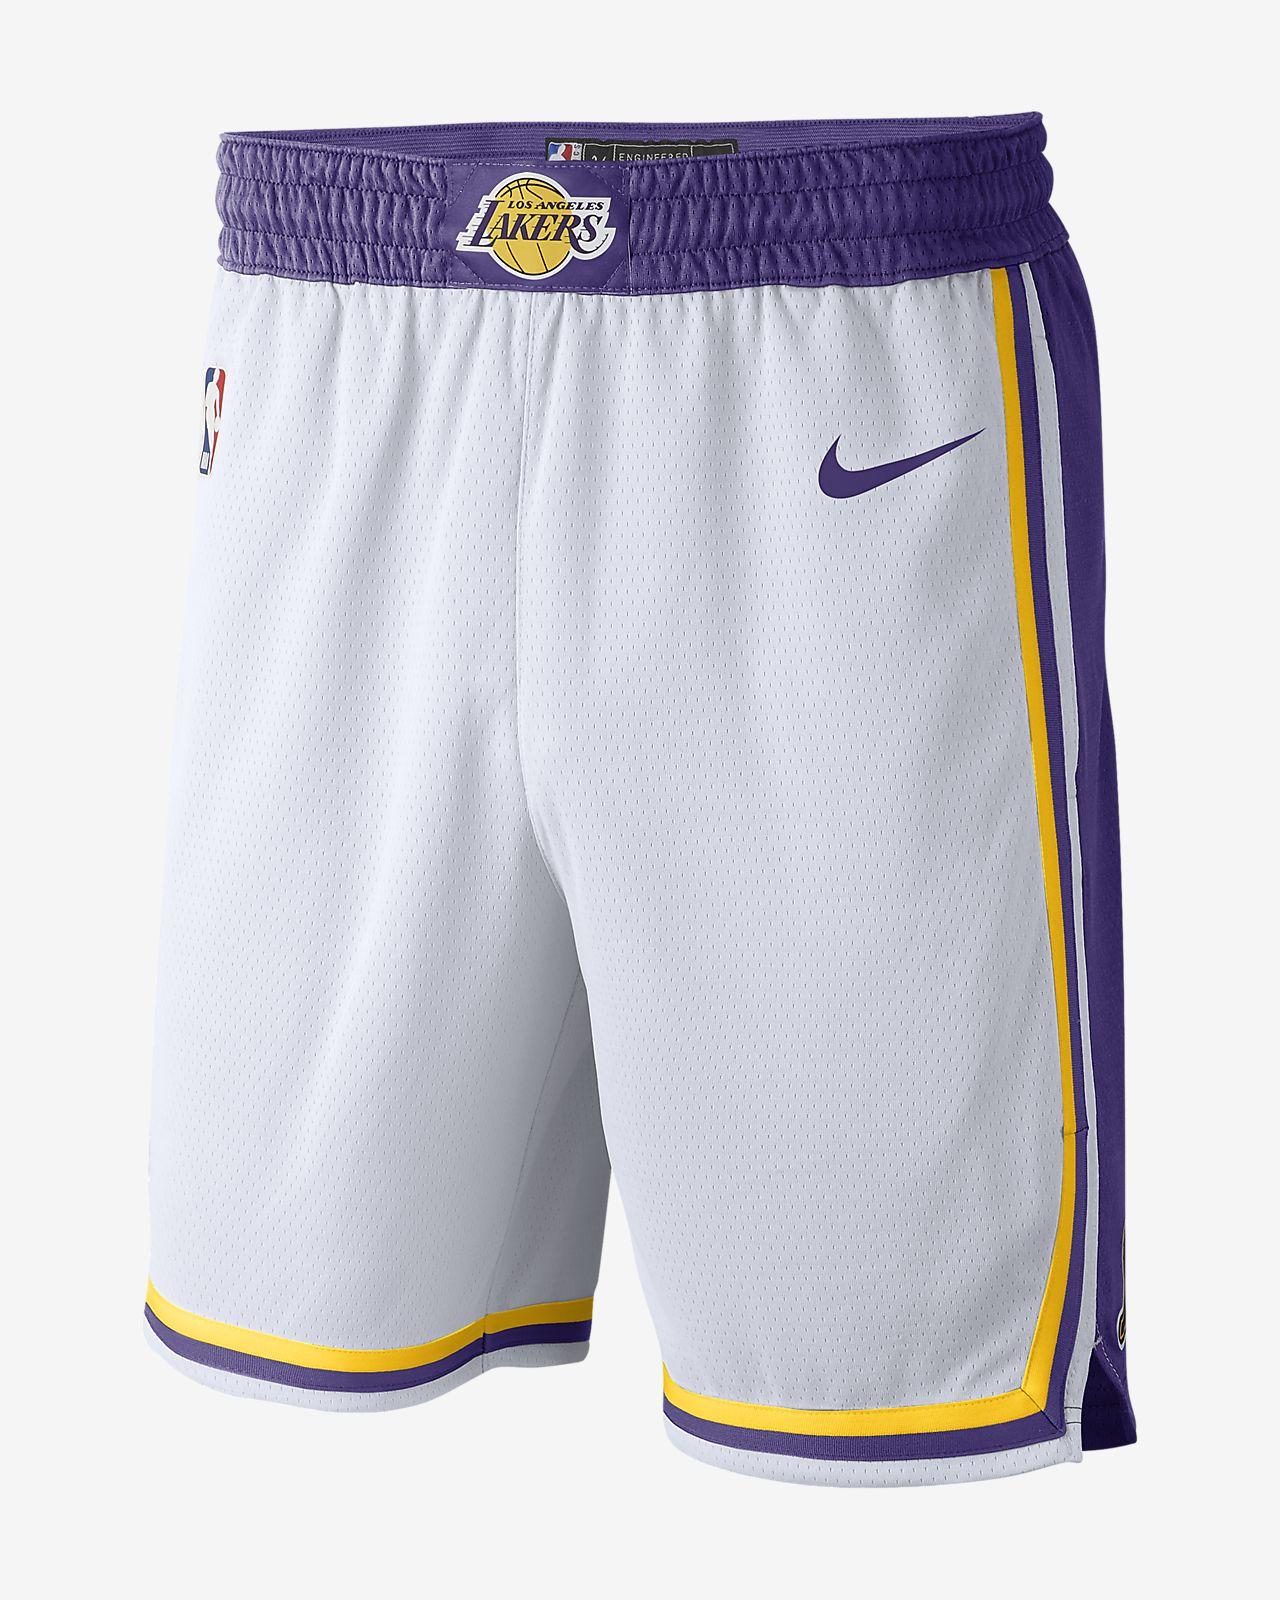 Los Angeles Lakers Association Edition Swingman Nike NBA-Shorts für Herren